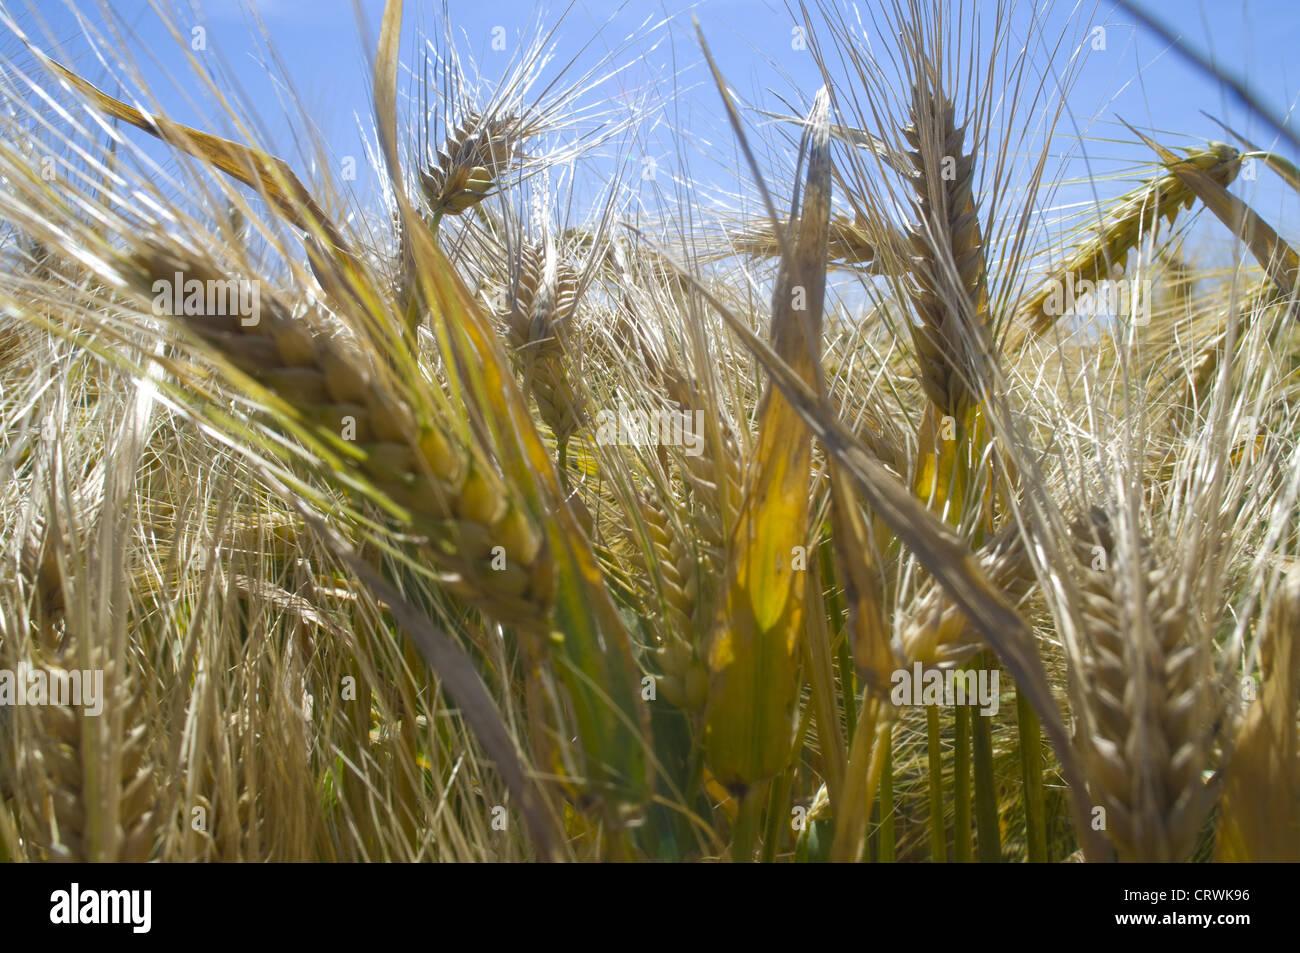 fields - Stock Image